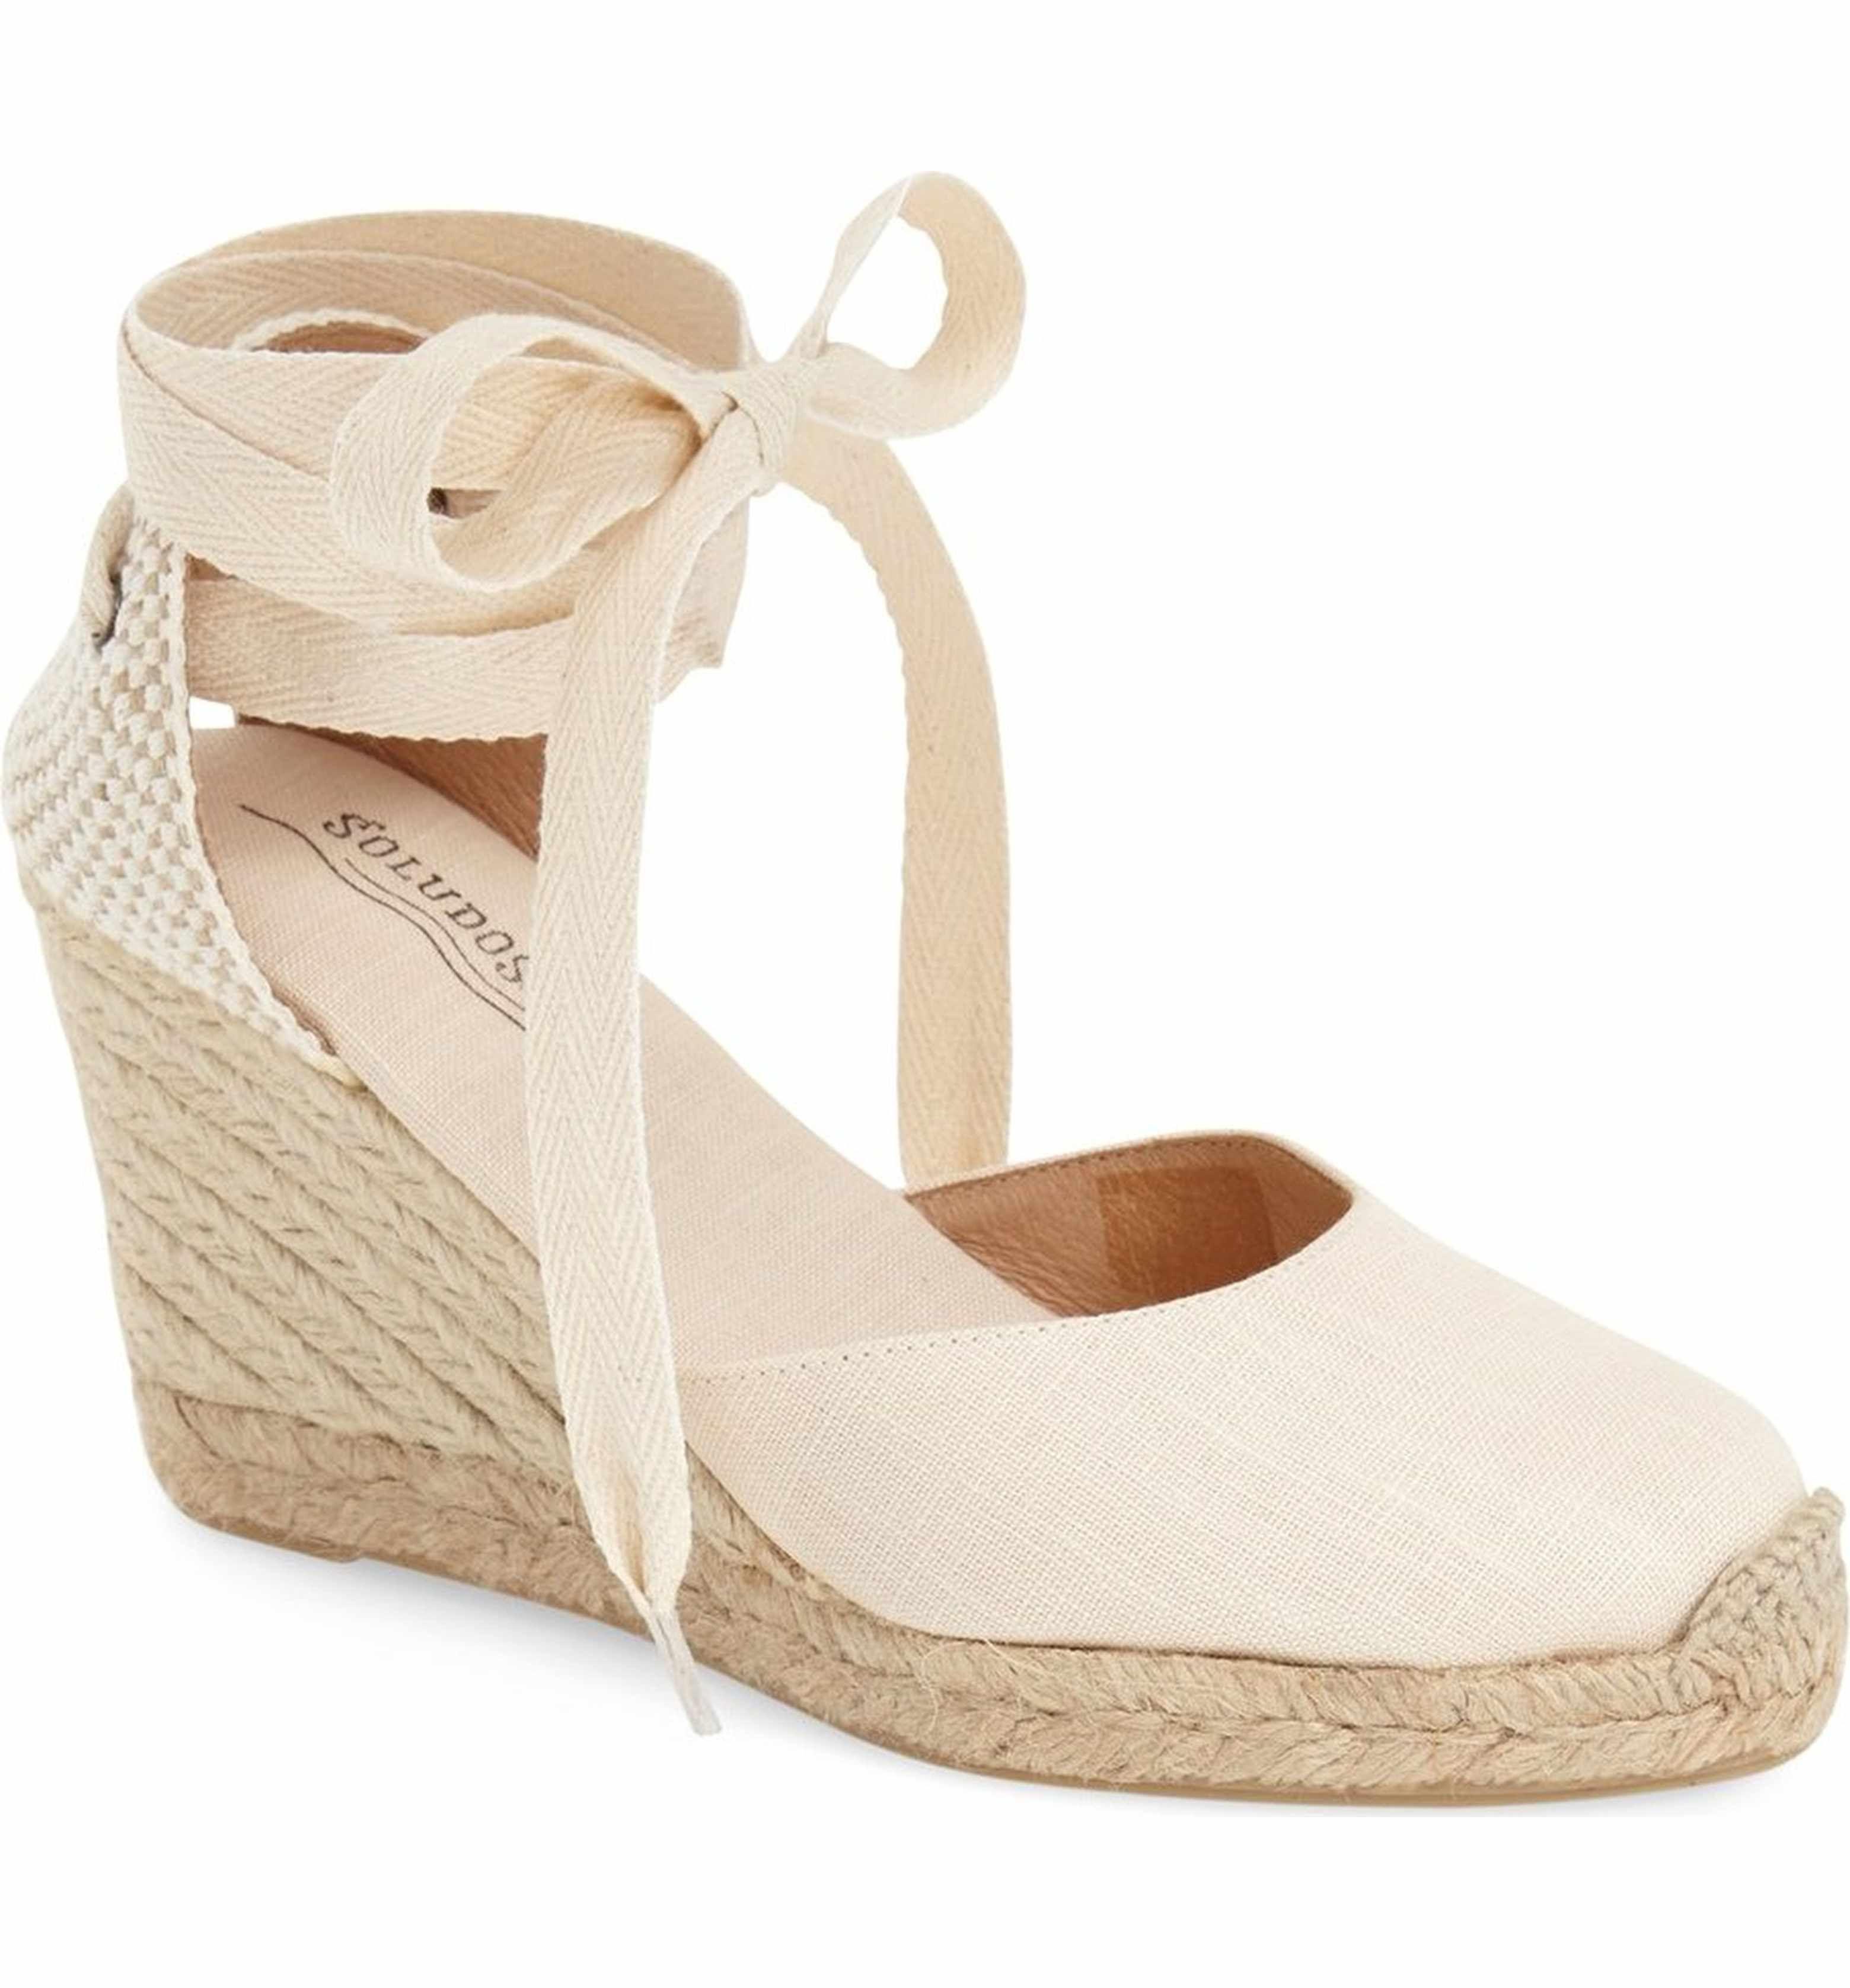 be29dc8fec1 Main Image - Soludos Wedge Lace-Up Espadrille Sandal (Women)